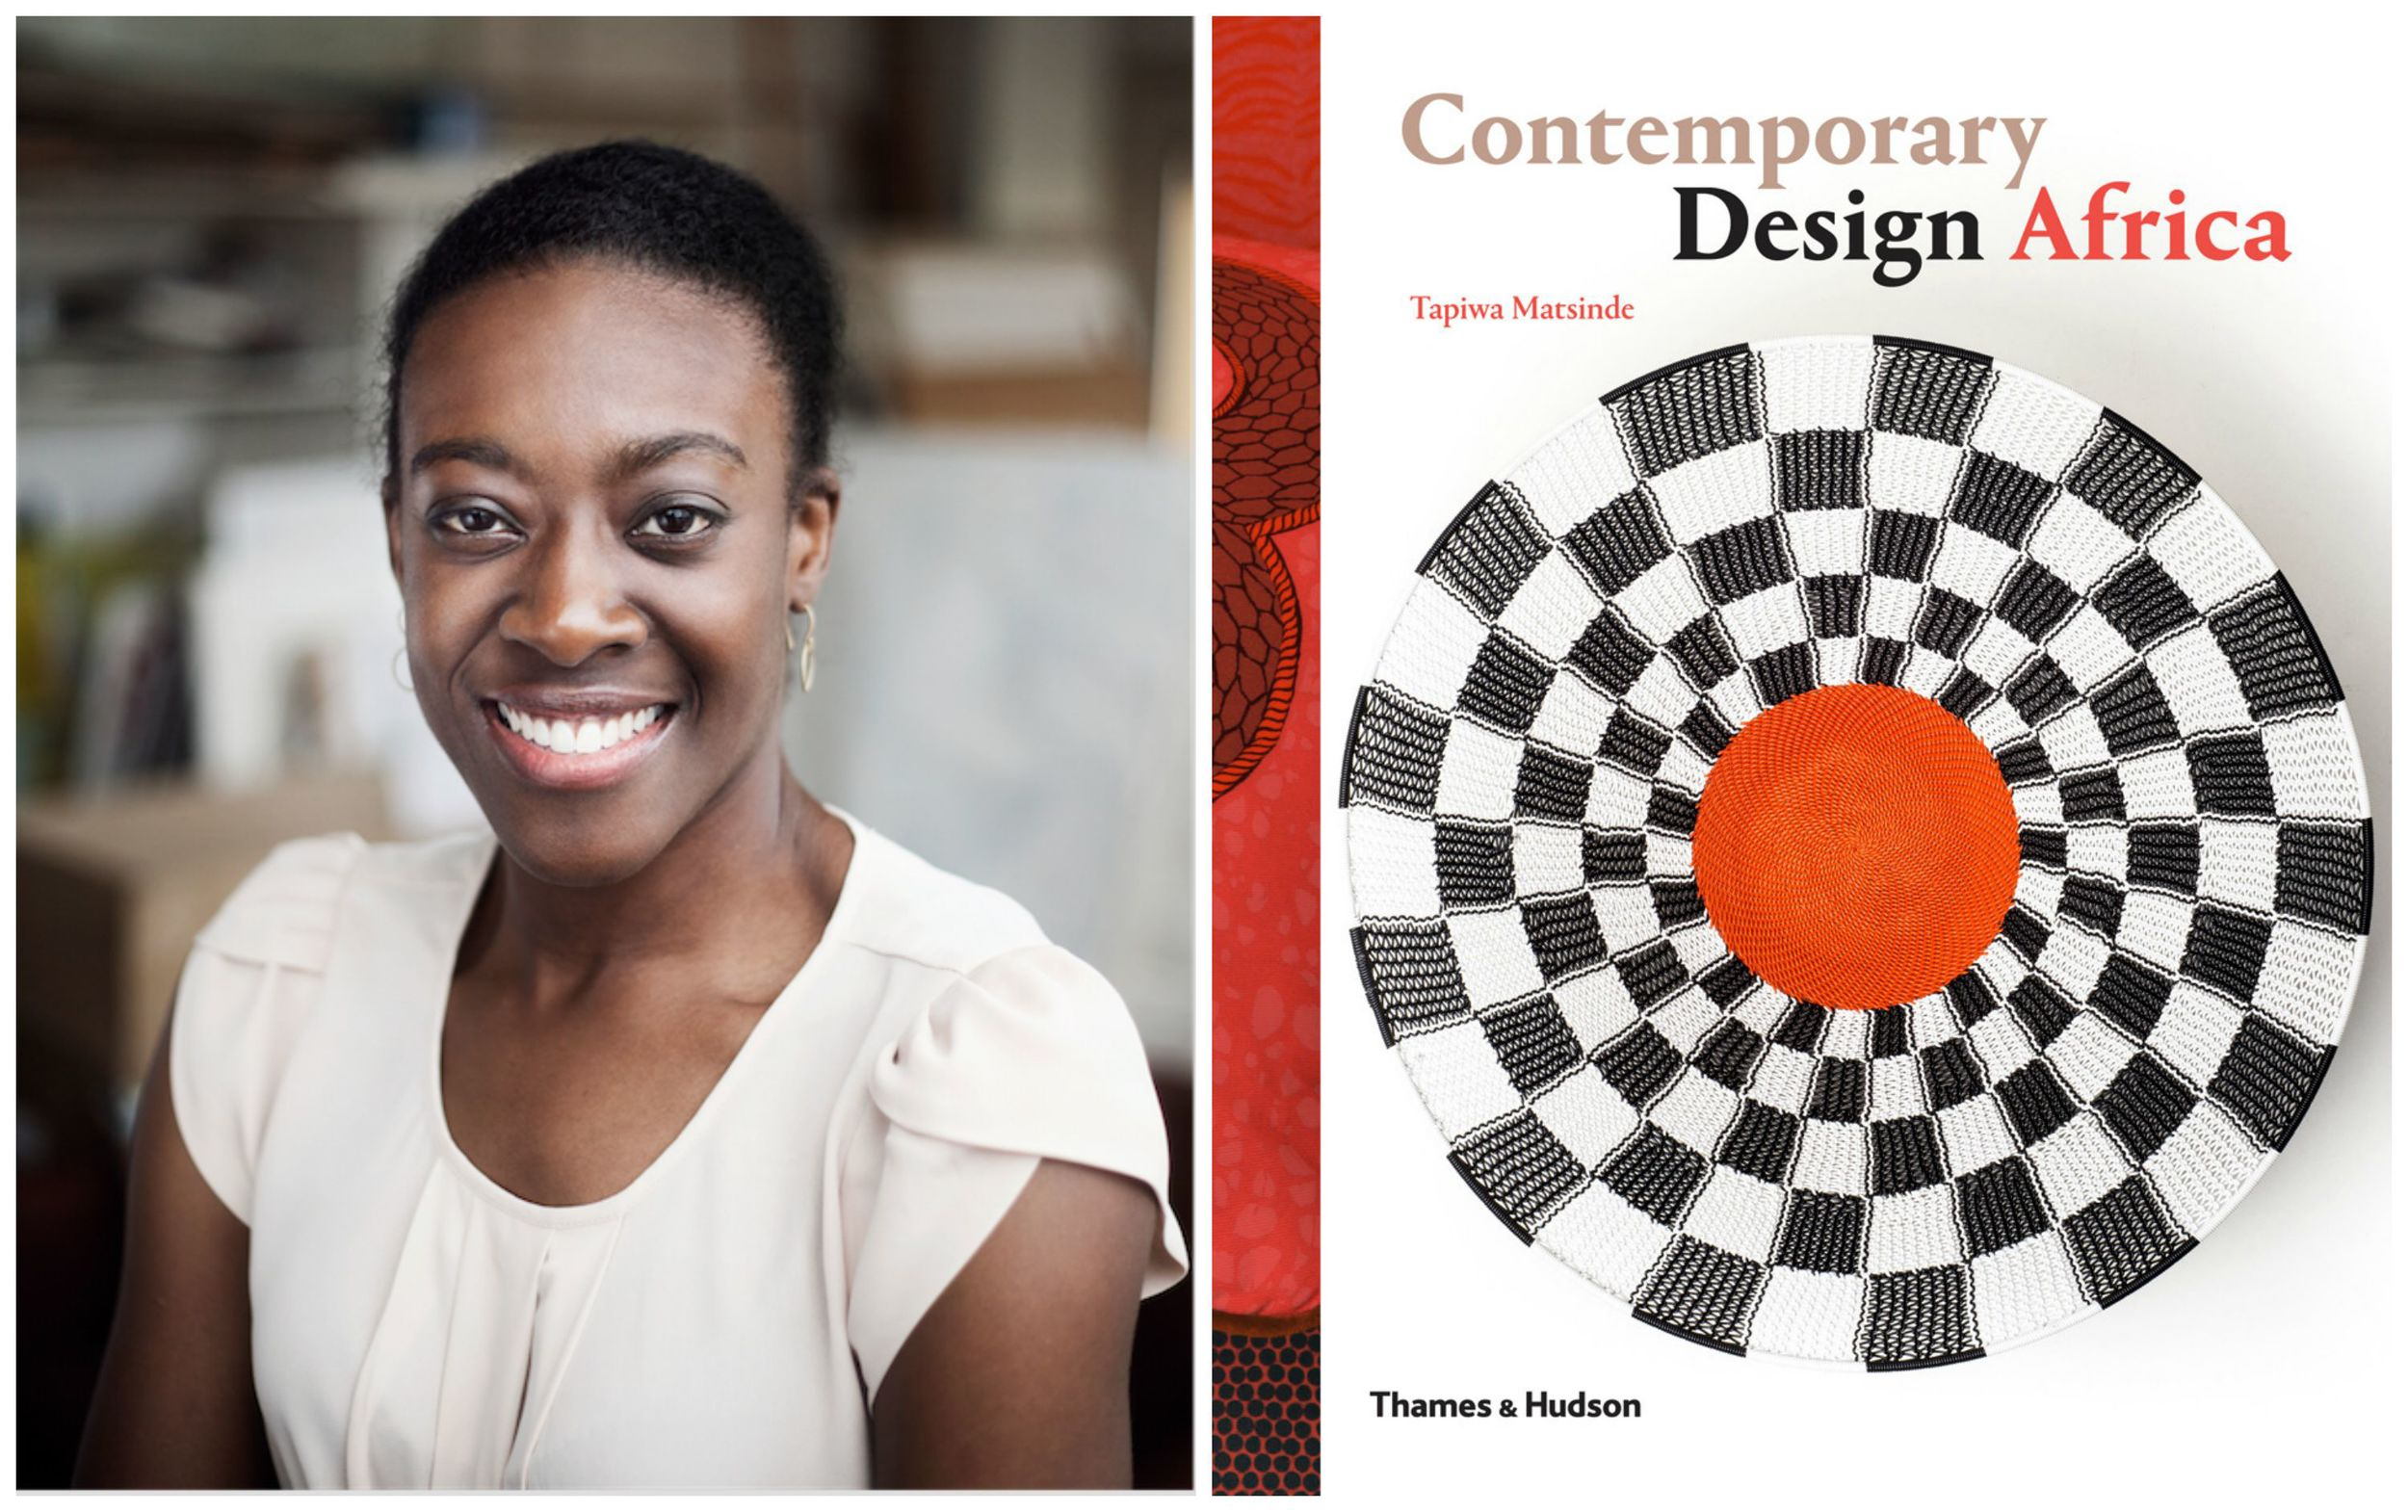 Tapiwa Matsinde, author of'Contemporary Design Africa'